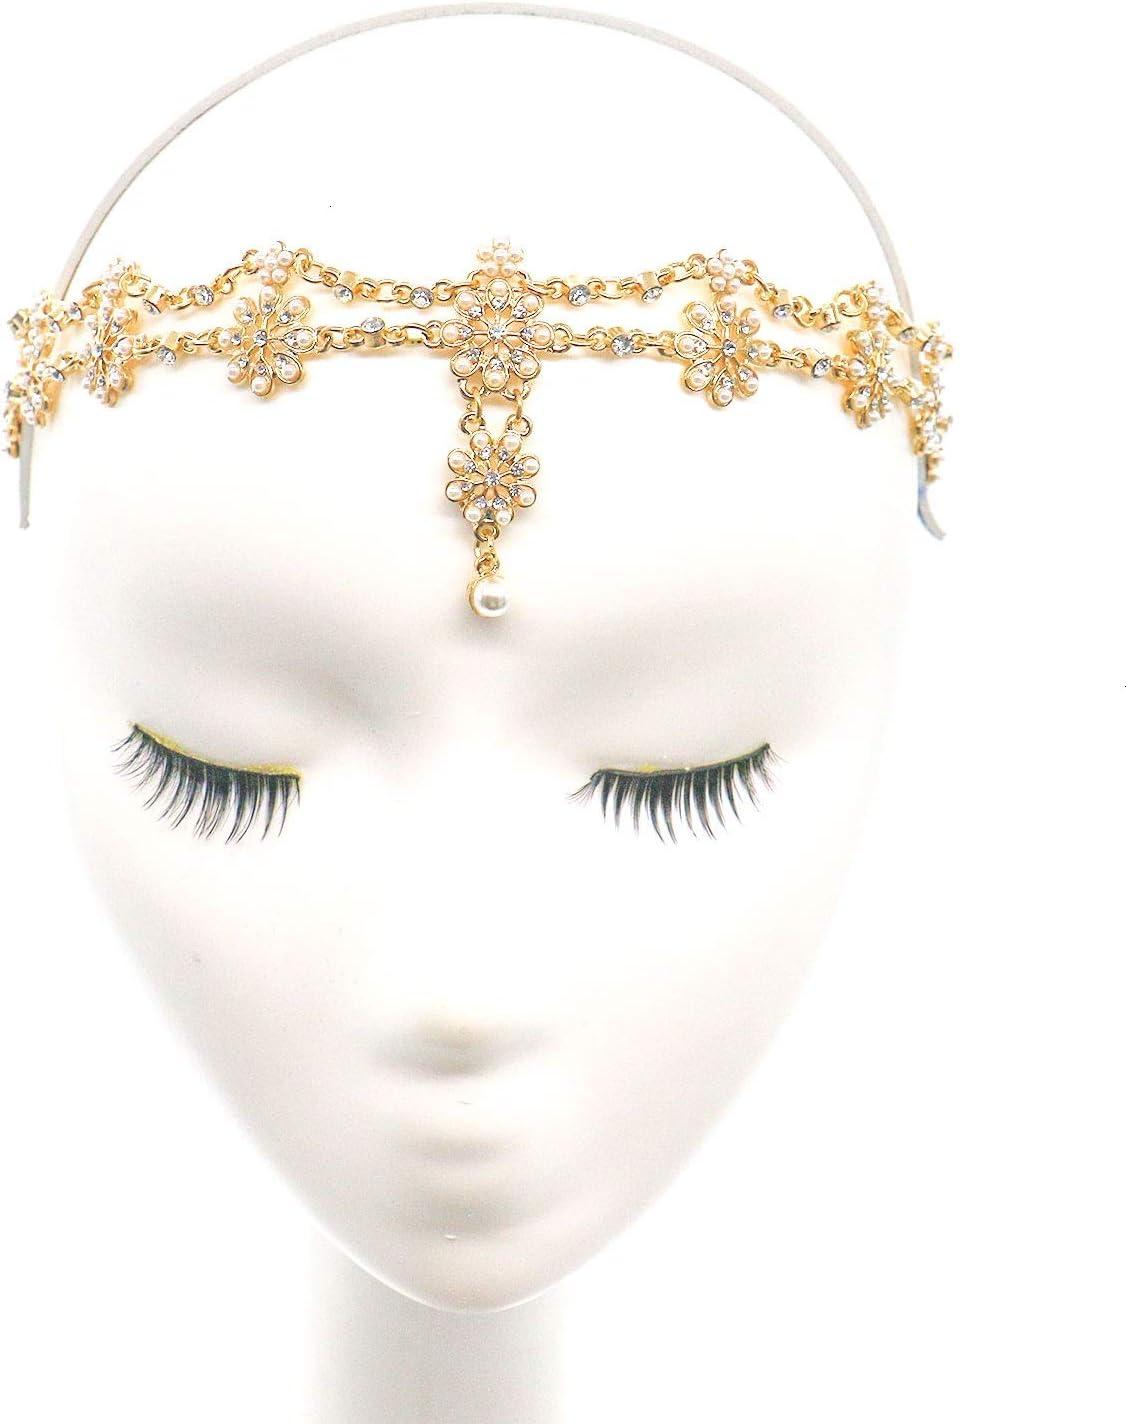 Gonioa Head Chain Jewelry Headband Crystal Bohemian Hair Accessories with Peal Women Head Chains Forehead Chain Rhinestone Headpieces with Drop Pendant